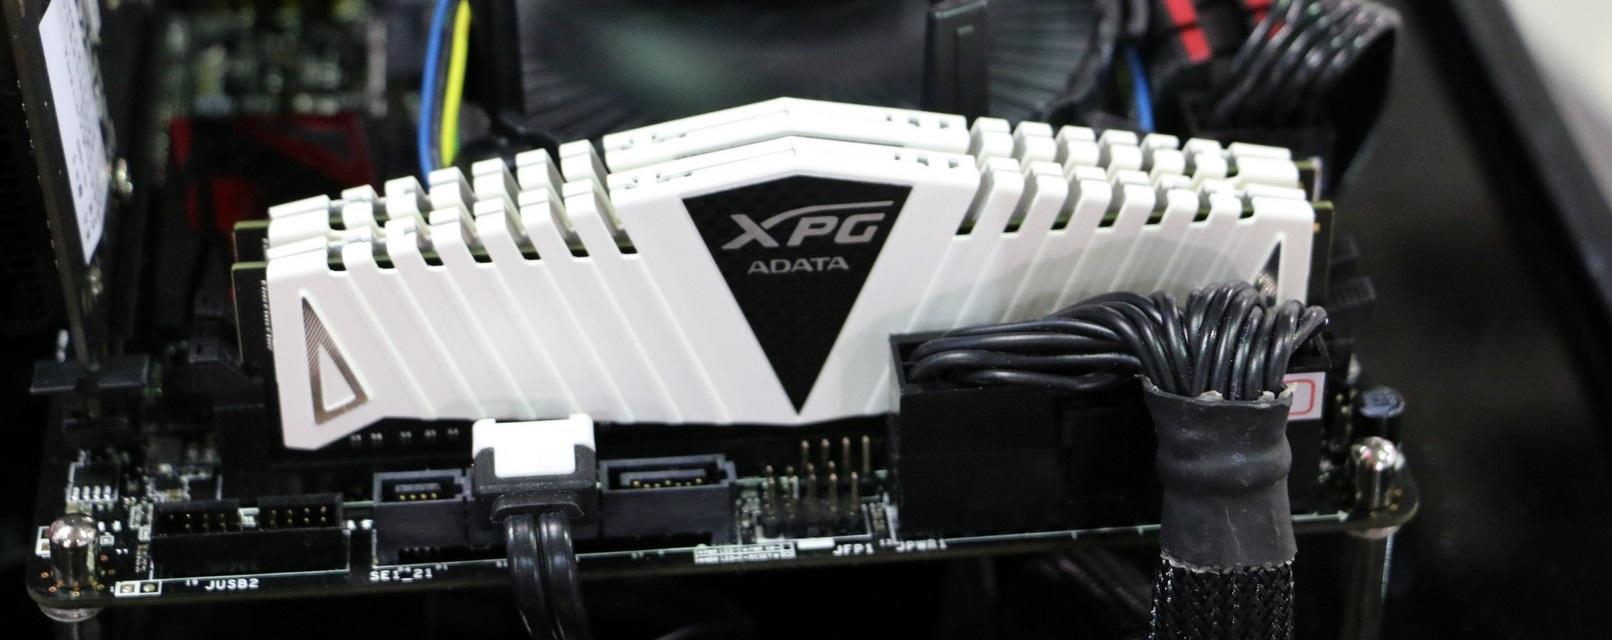 Adata XPG Z1 - portada